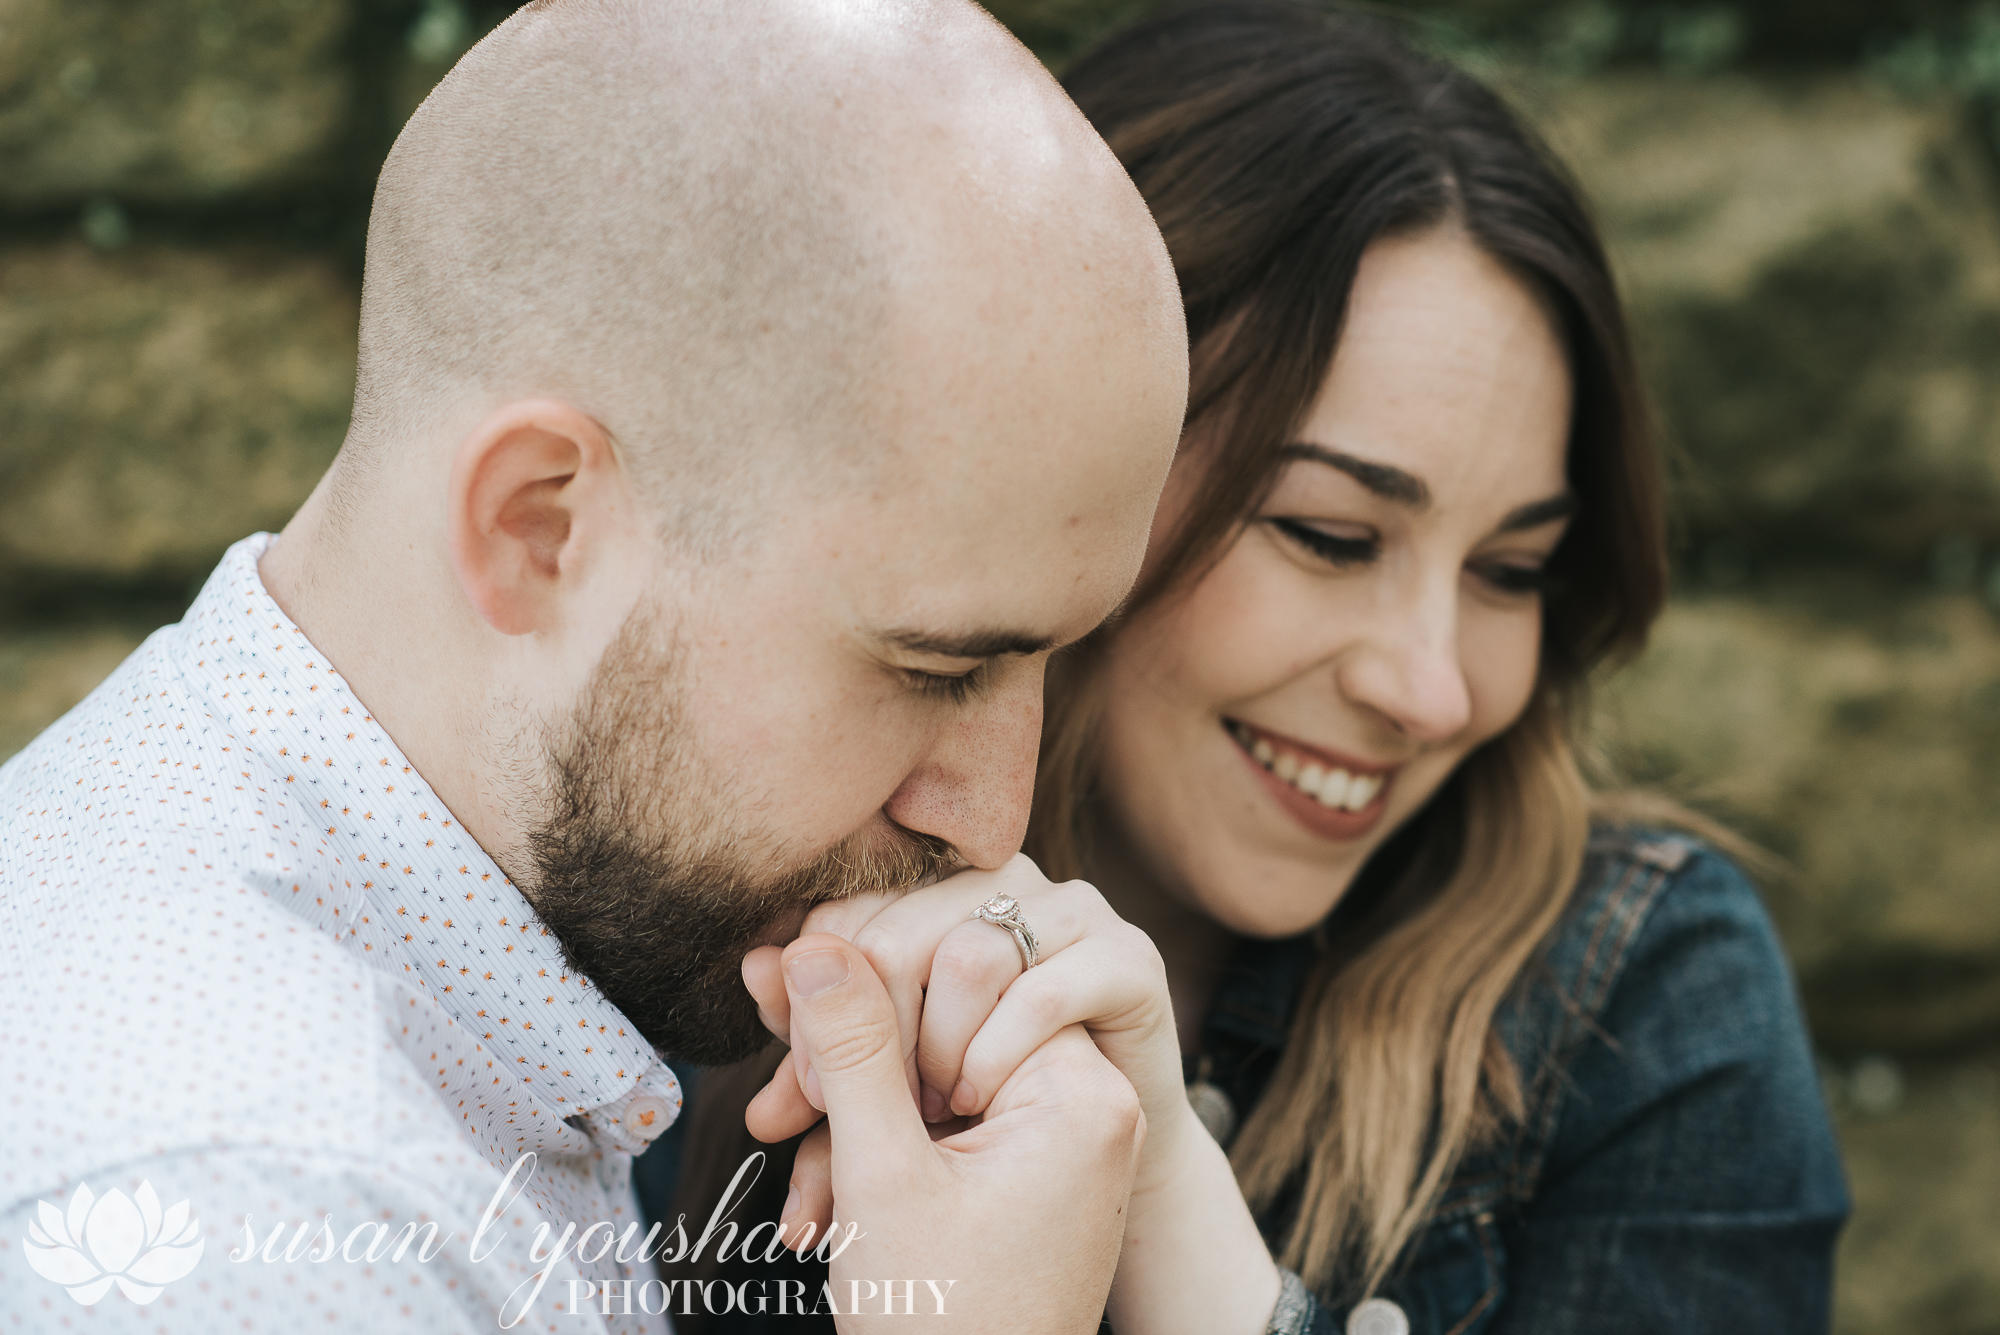 BLOG Jess and Noah 05-20-2018 SLY Photography-3.jpg